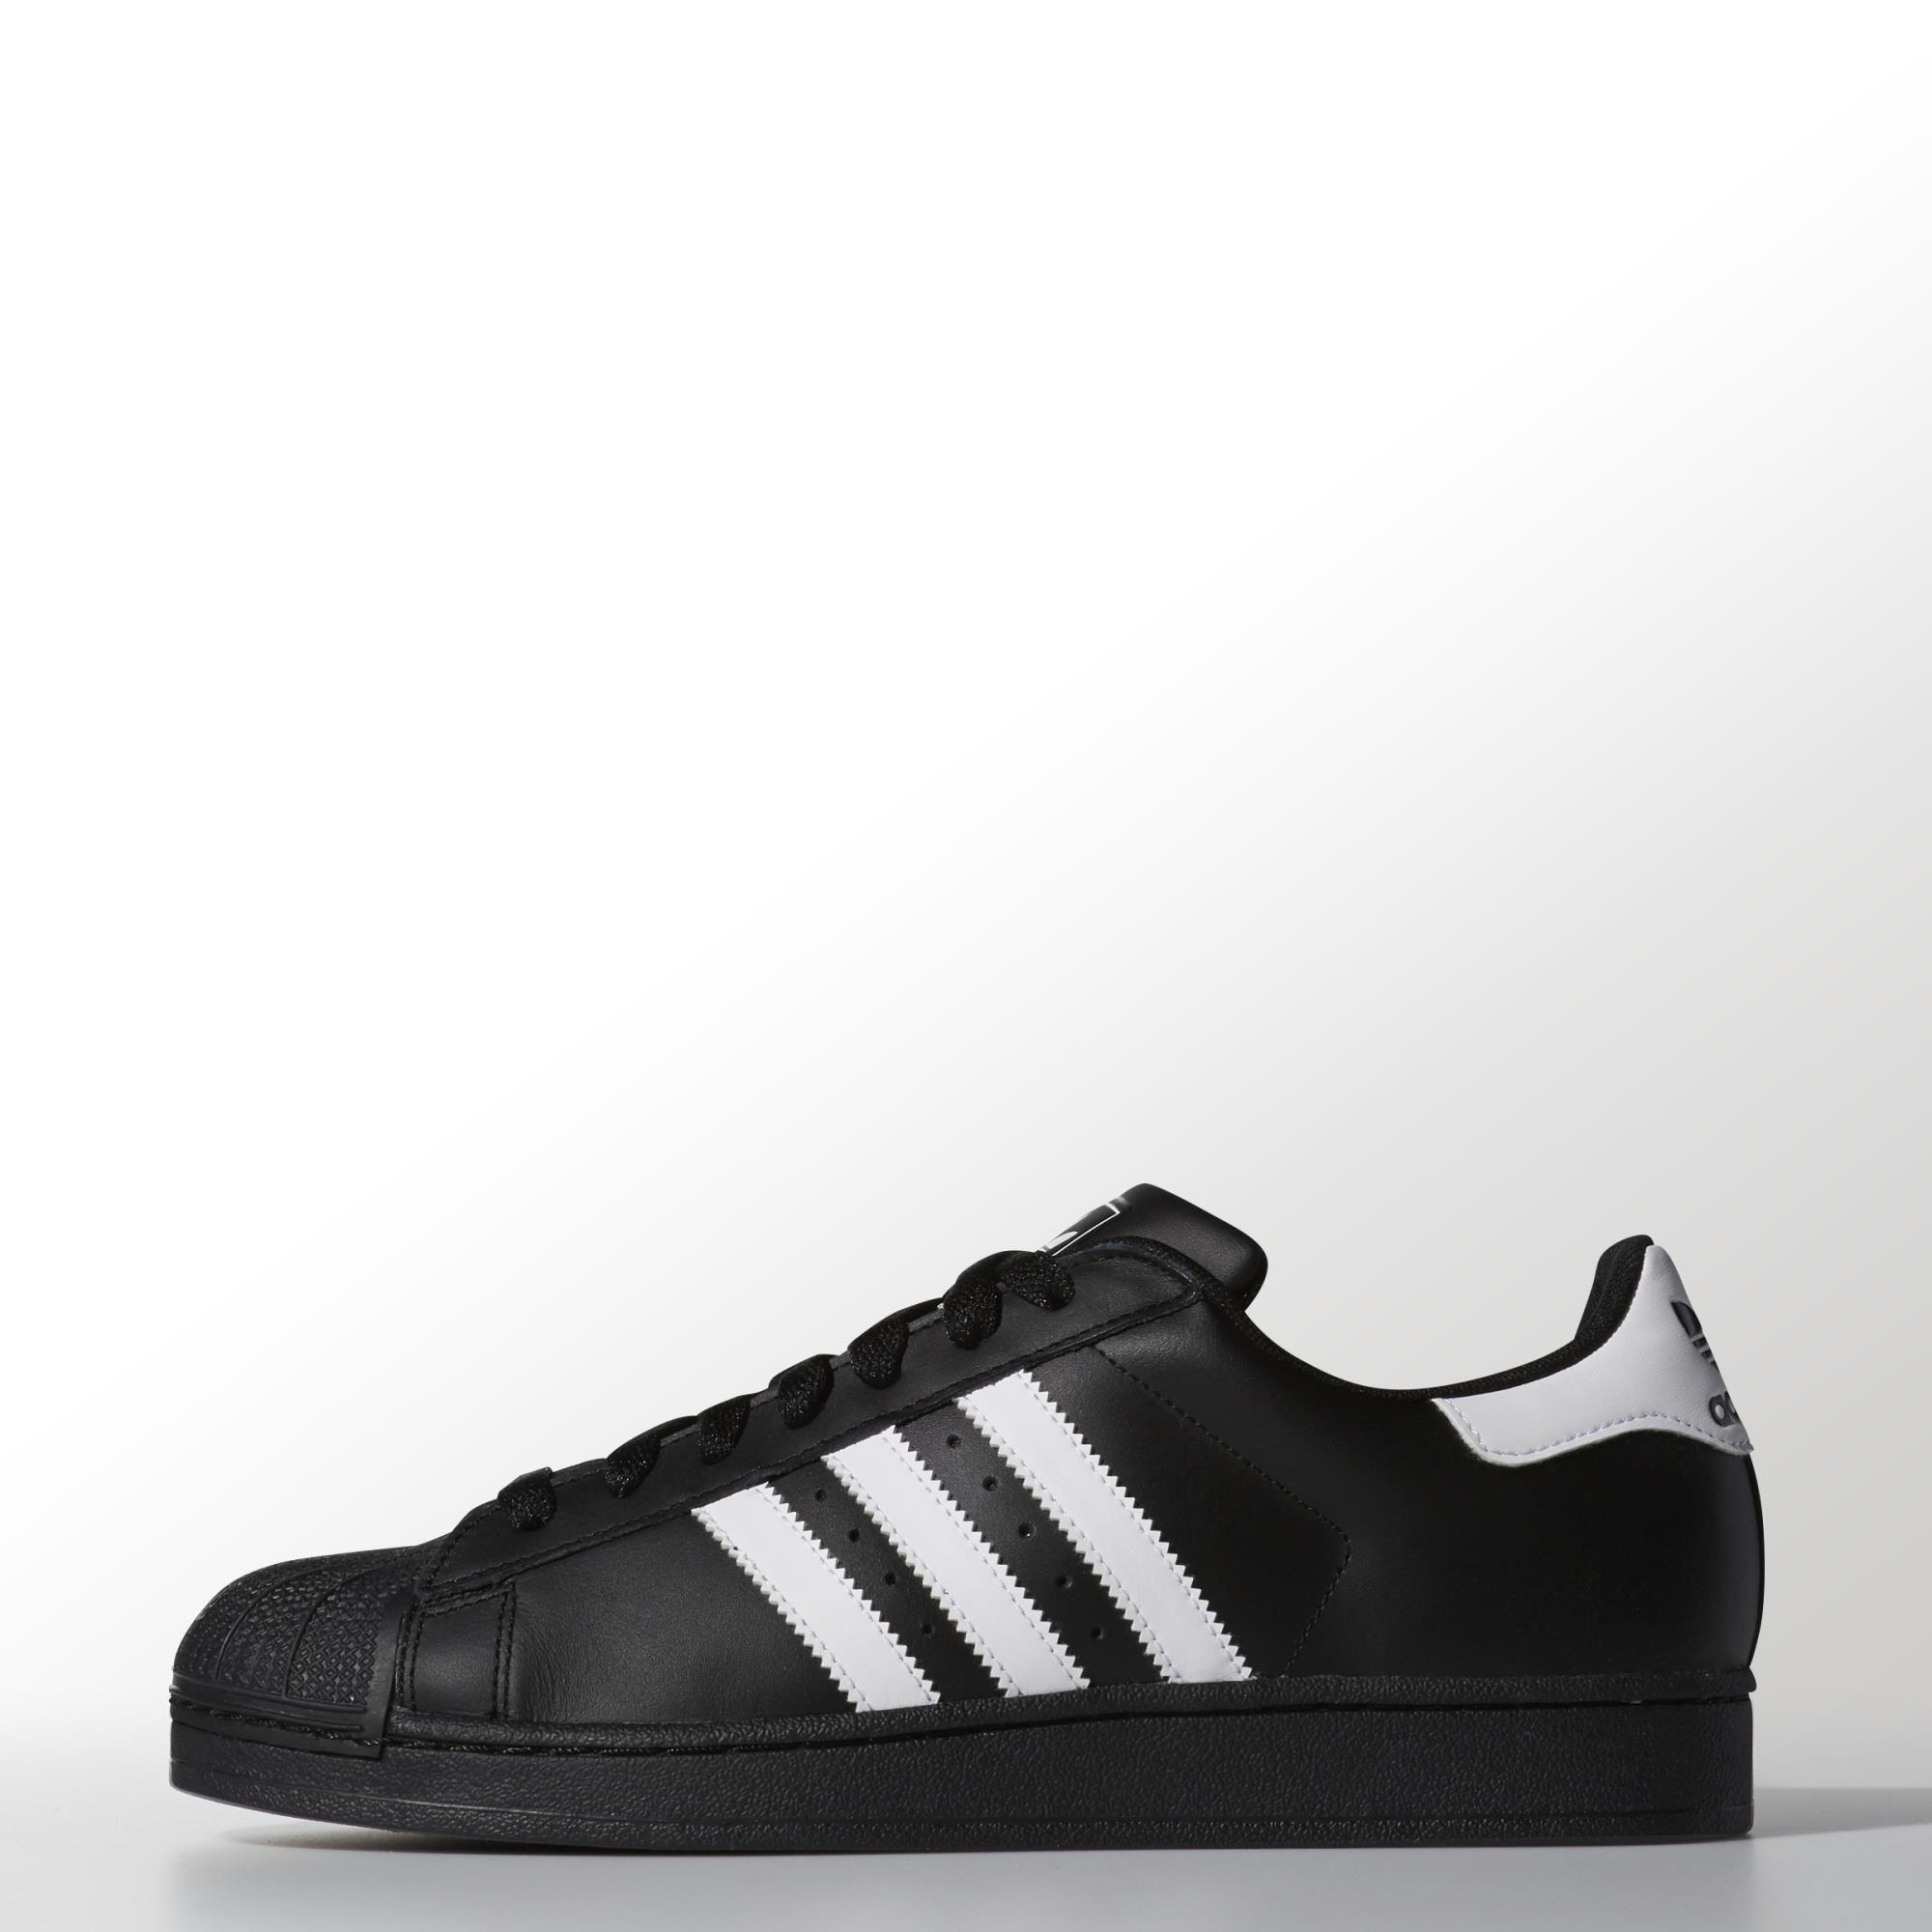 Calzado Superstar HombreColombia Ii Para Shoes Adidas OX0PN8nwk